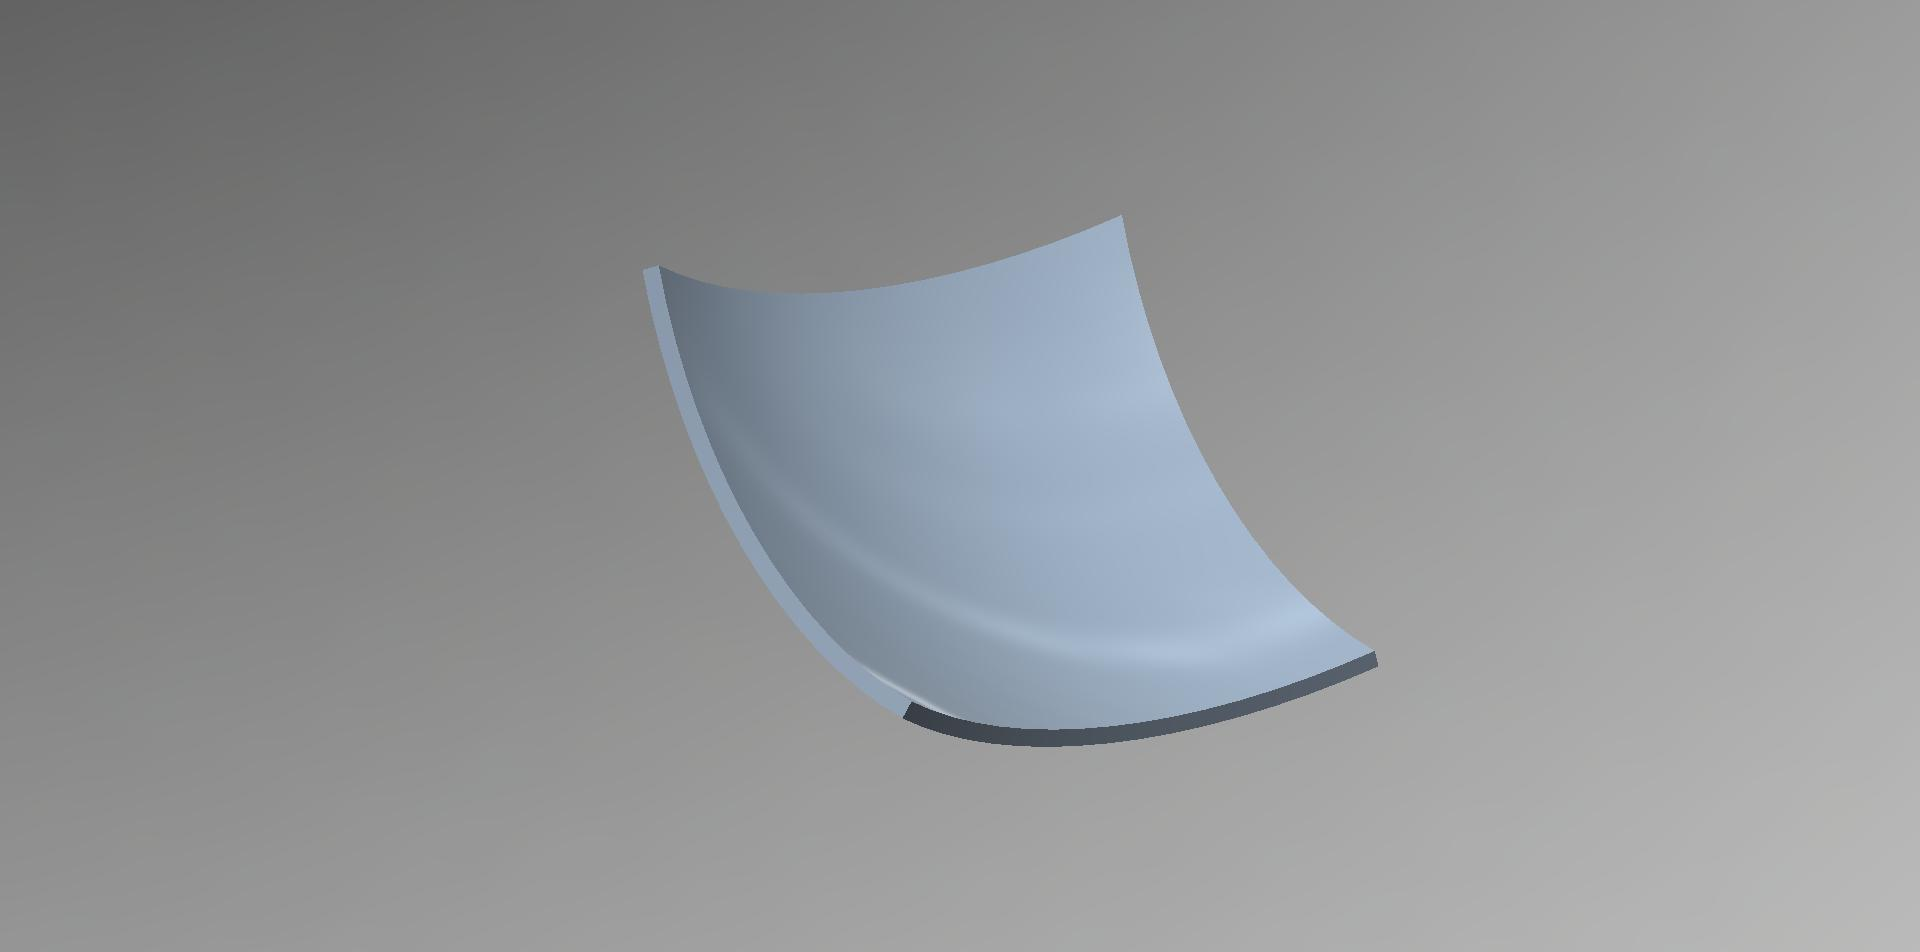 parabolic reflector - Autodesk Community- Inventor